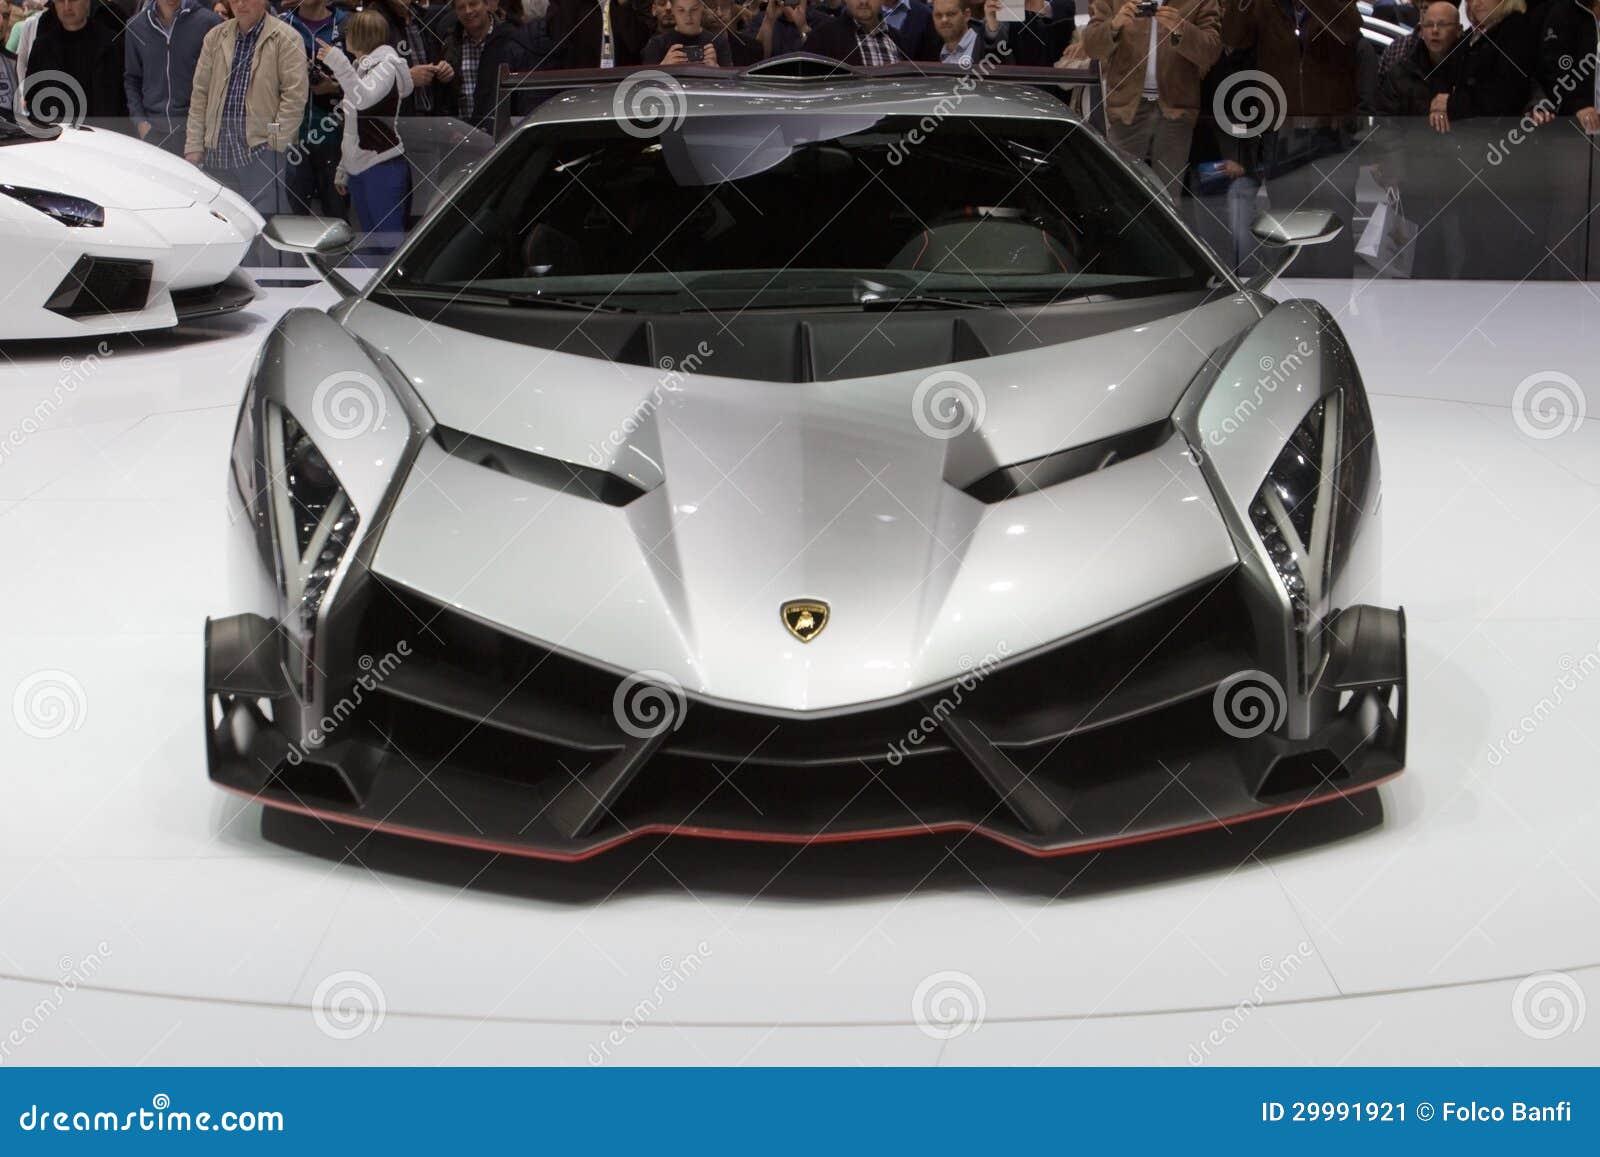 Estreno mundial de Lamborghini Veneno - salón del automóvil 2013 de Ginebra